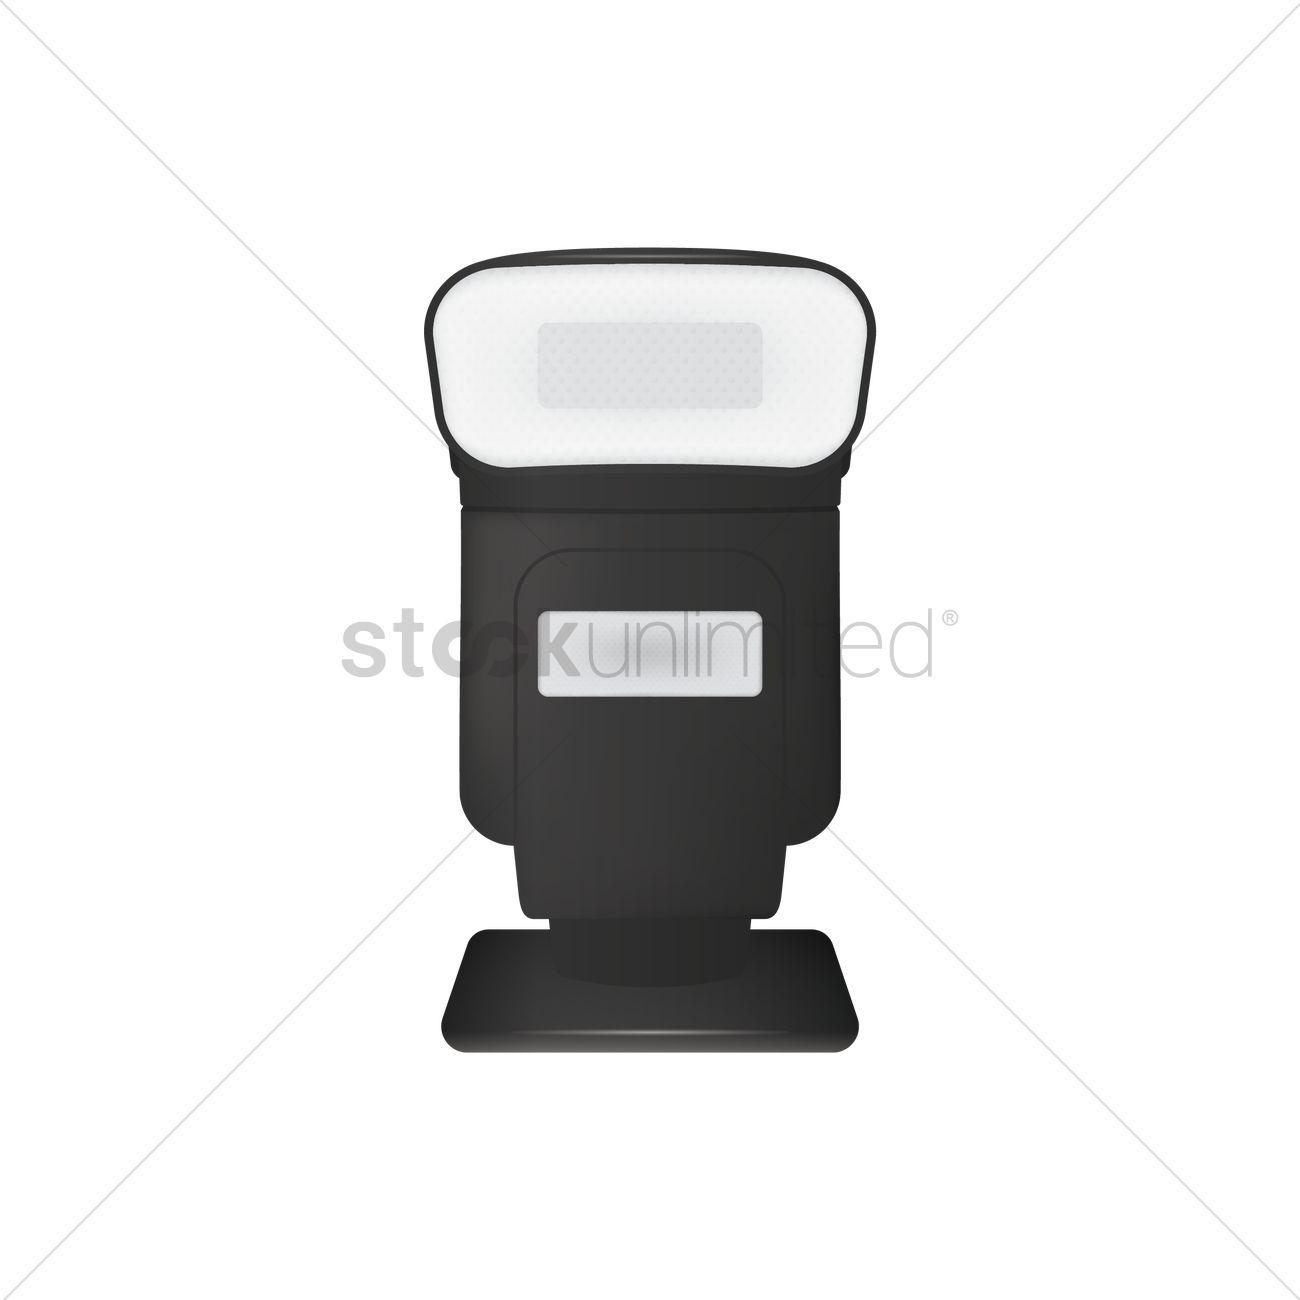 1300x1300 Camera Flash Vector Image